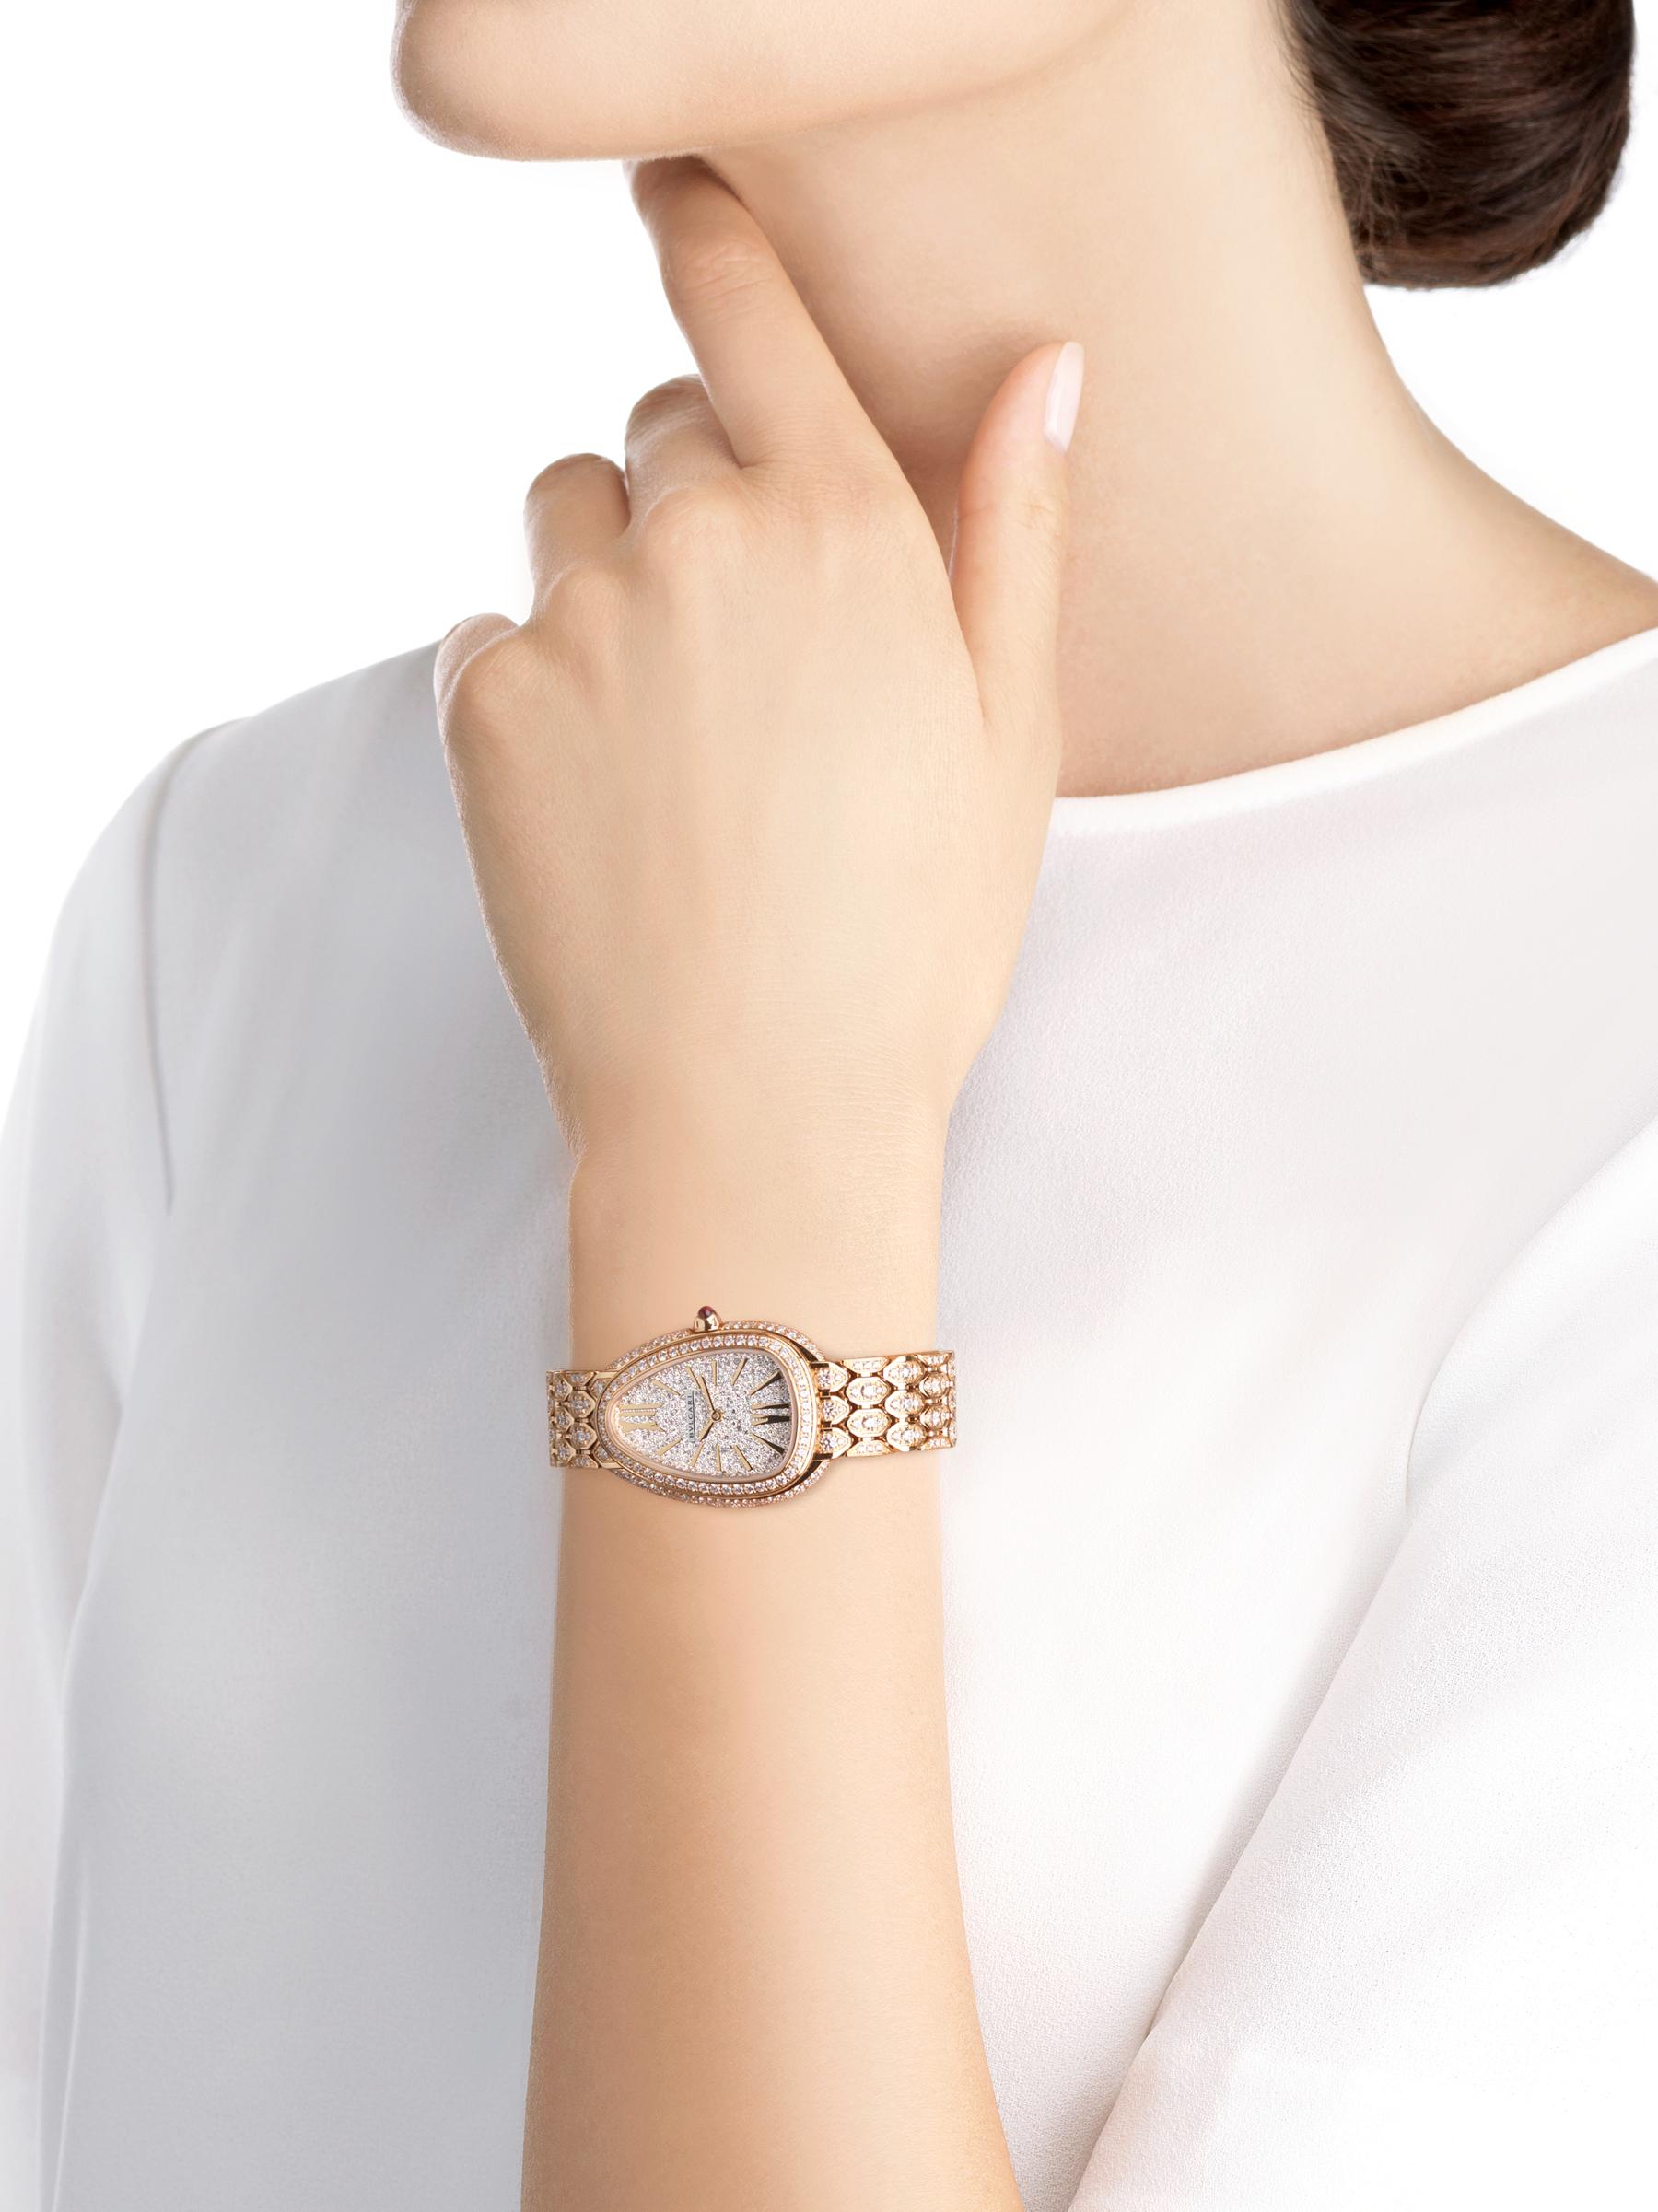 Serpenti Seduttori 腕錶,18K 玫瑰金錶殼和錶帶鑲飾鑽石,錶盤鋪滿密鑲鑽石。 103160 image 4